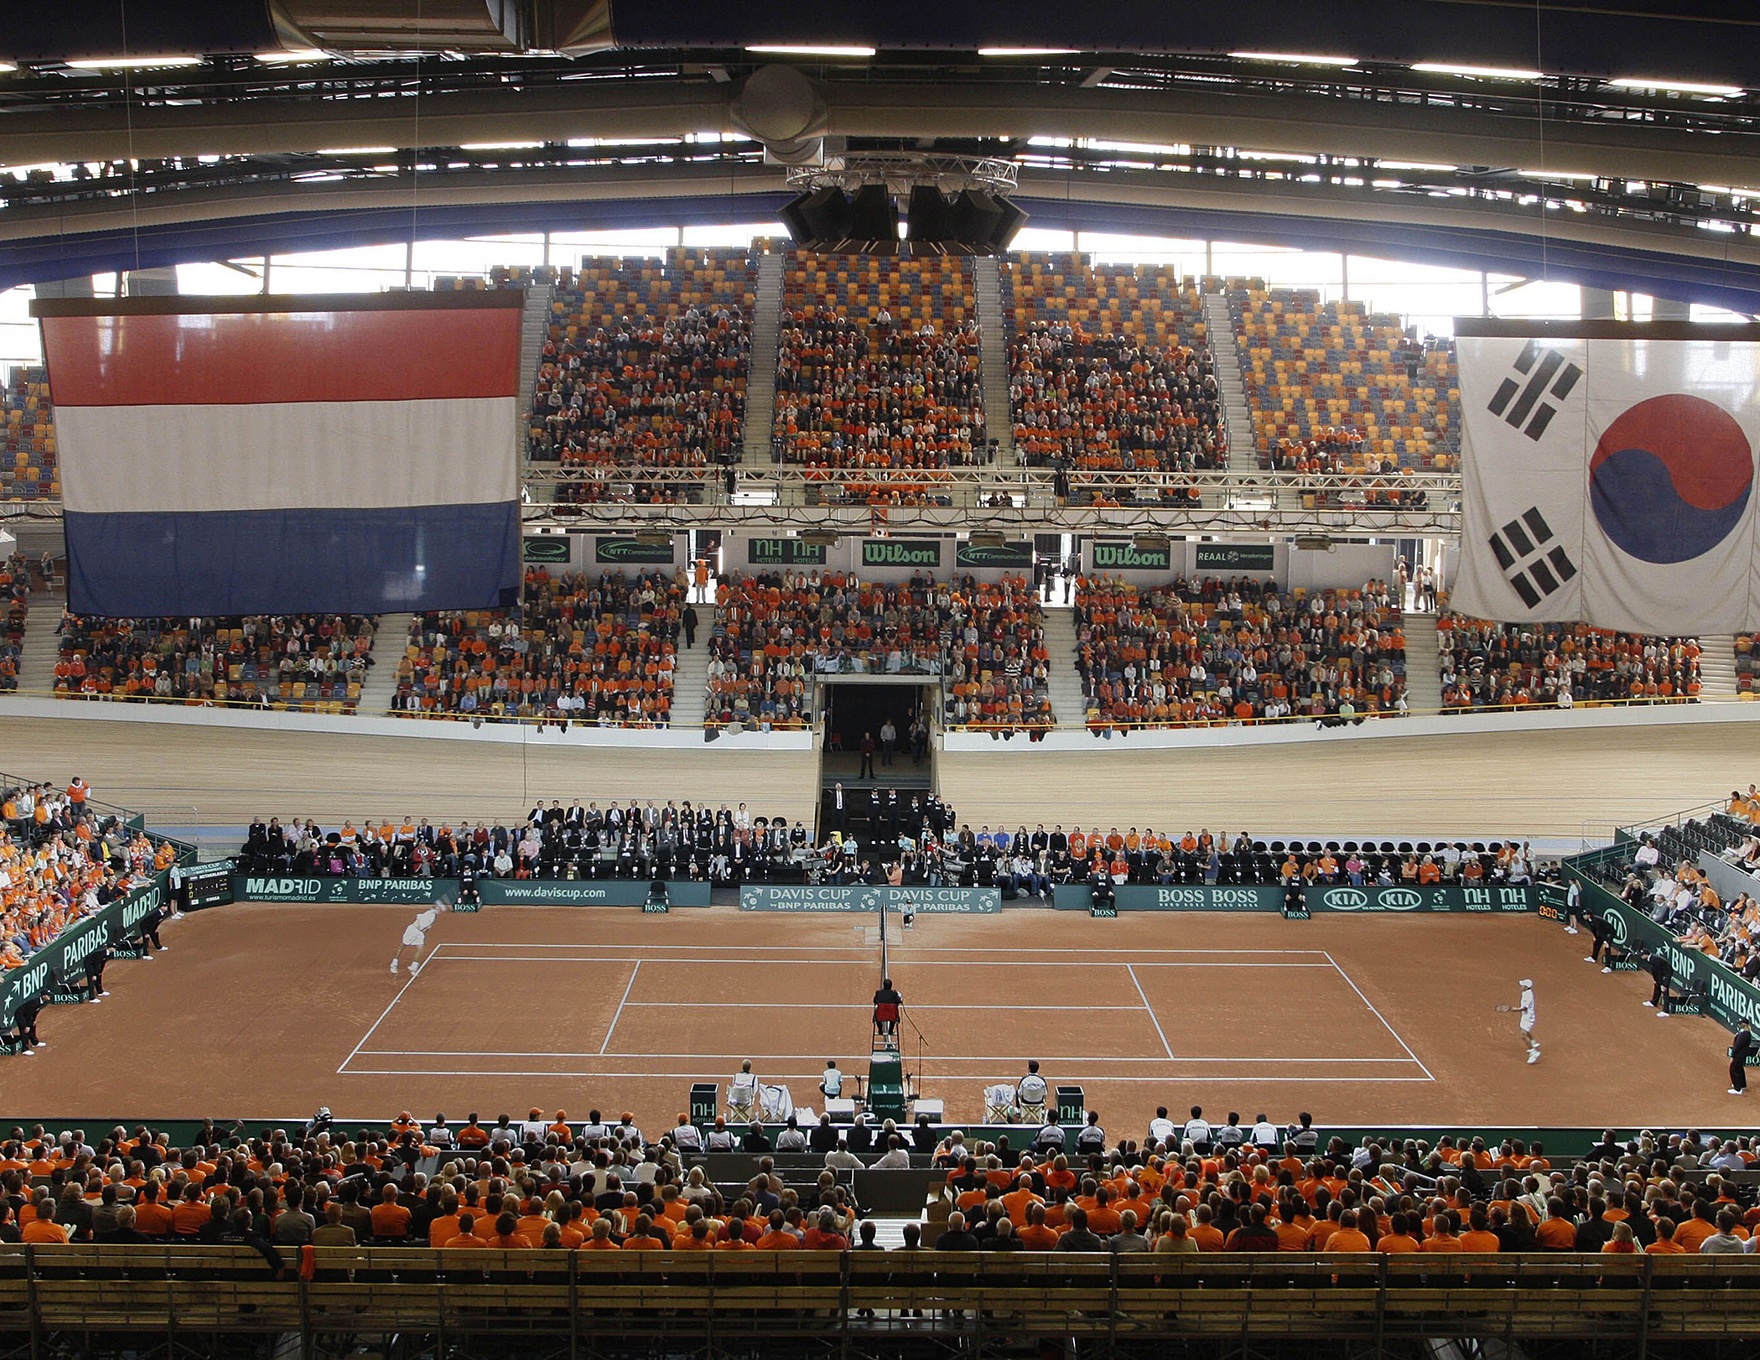 Velodrome Design Expertise Omnisportcentrum Apeldoorn Davis Cup Tennis Infield L